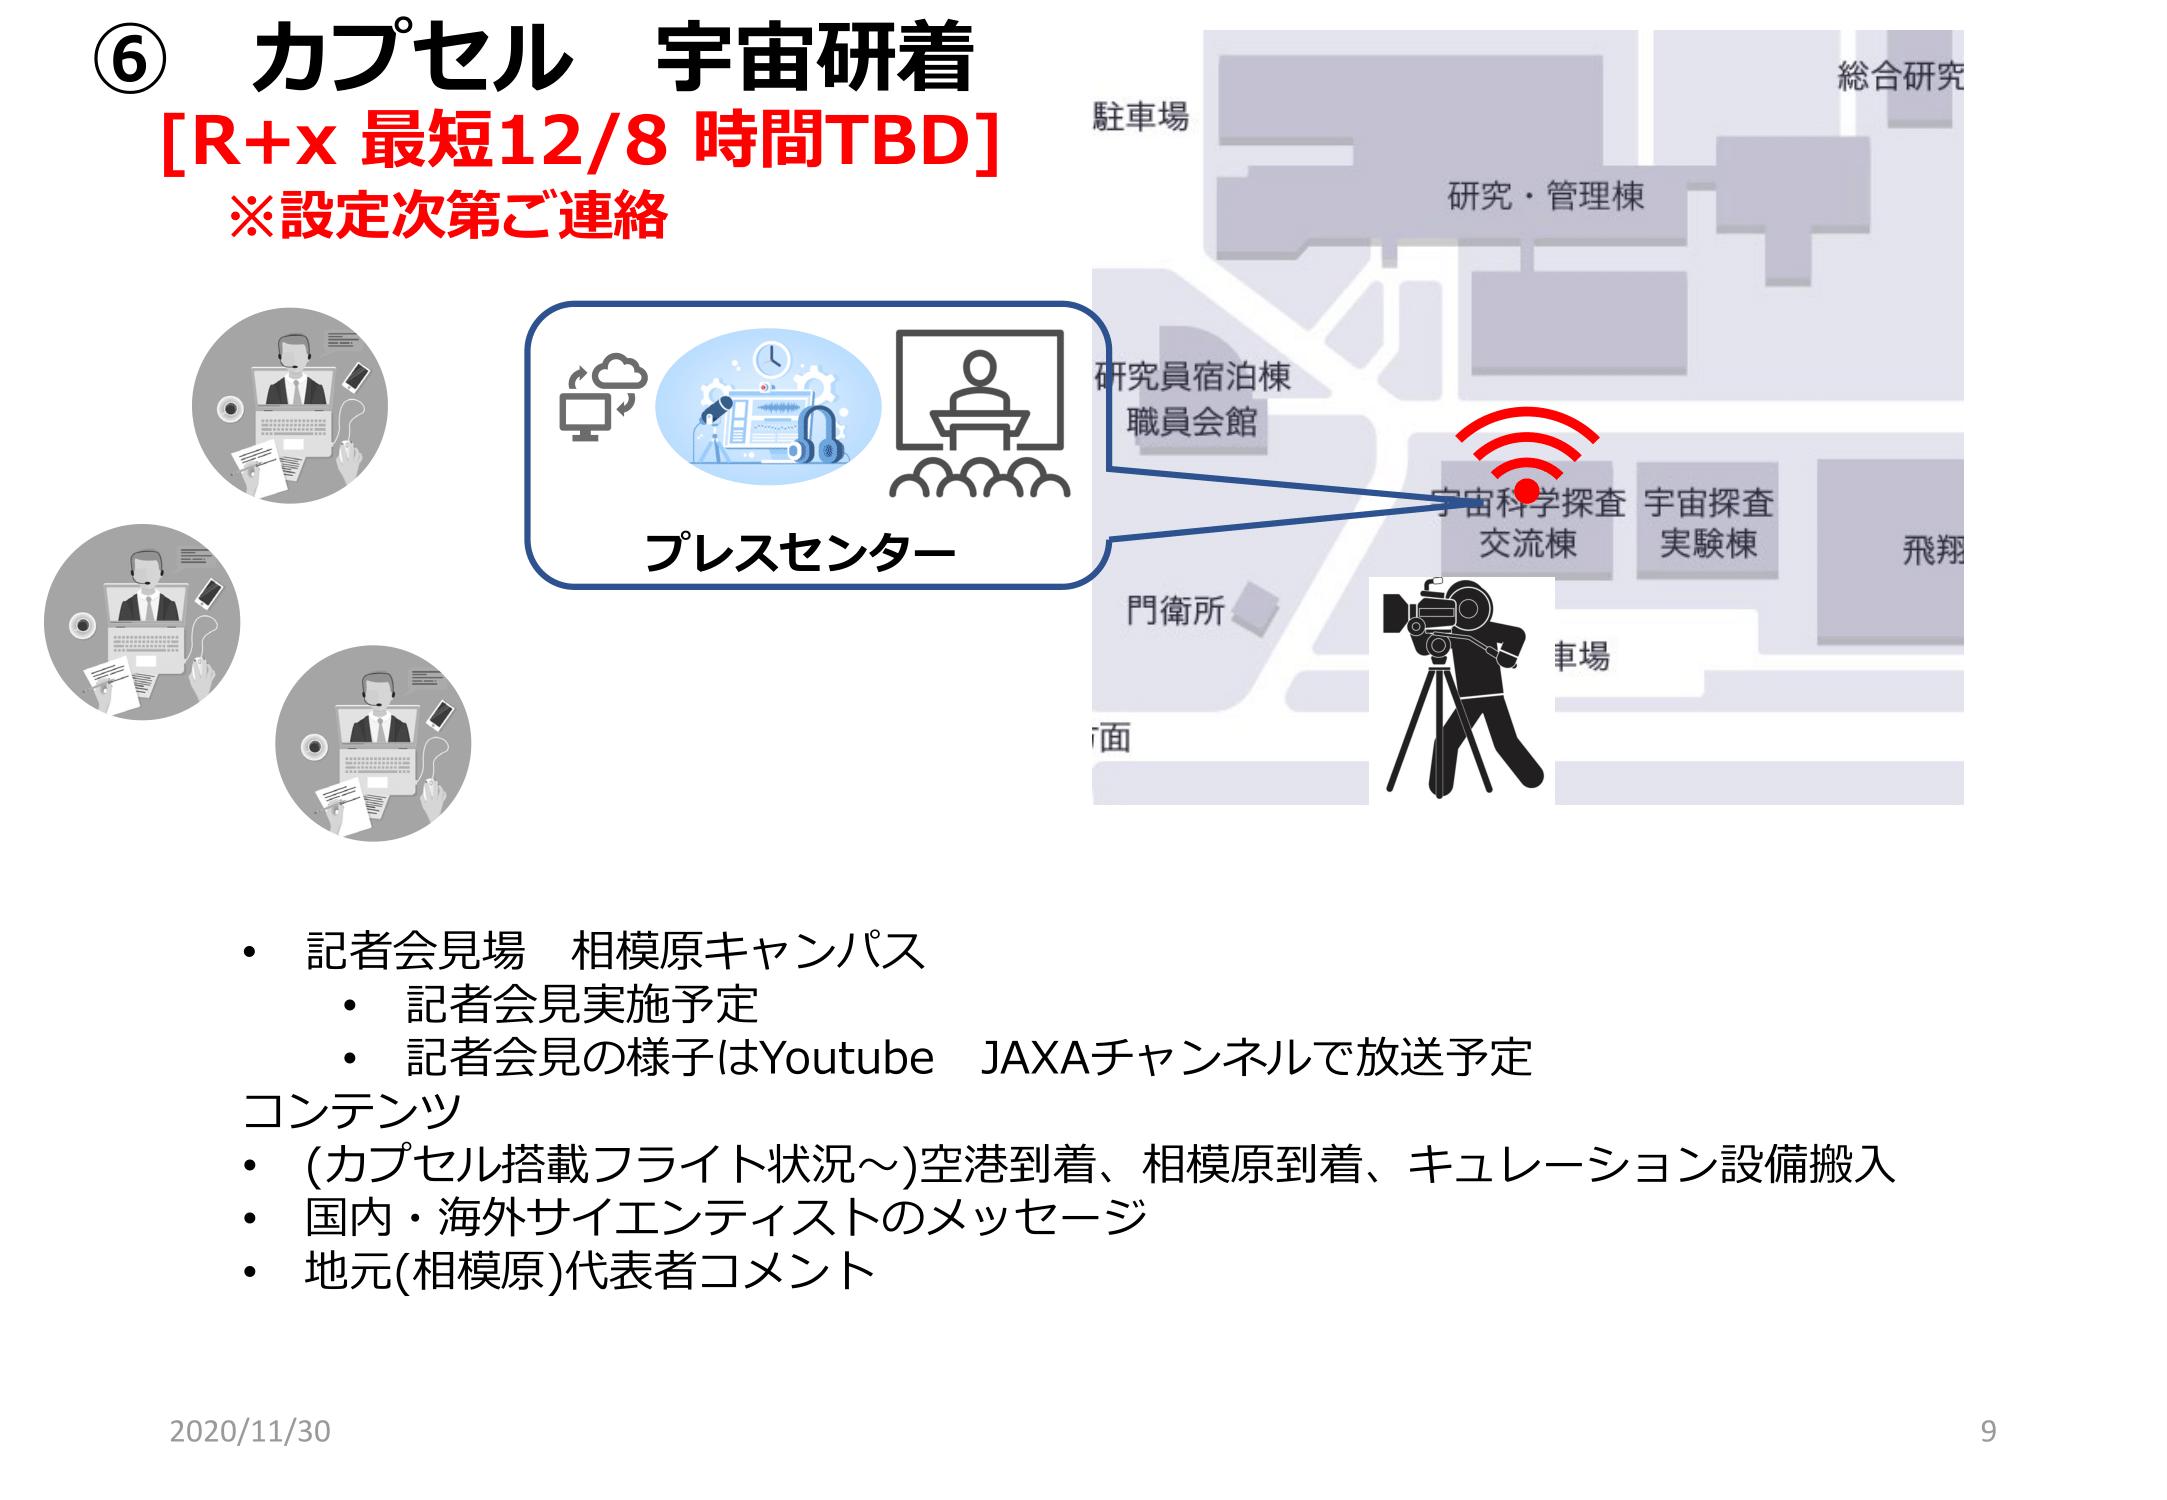 f:id:Imamura:20201130154409p:plain:h250